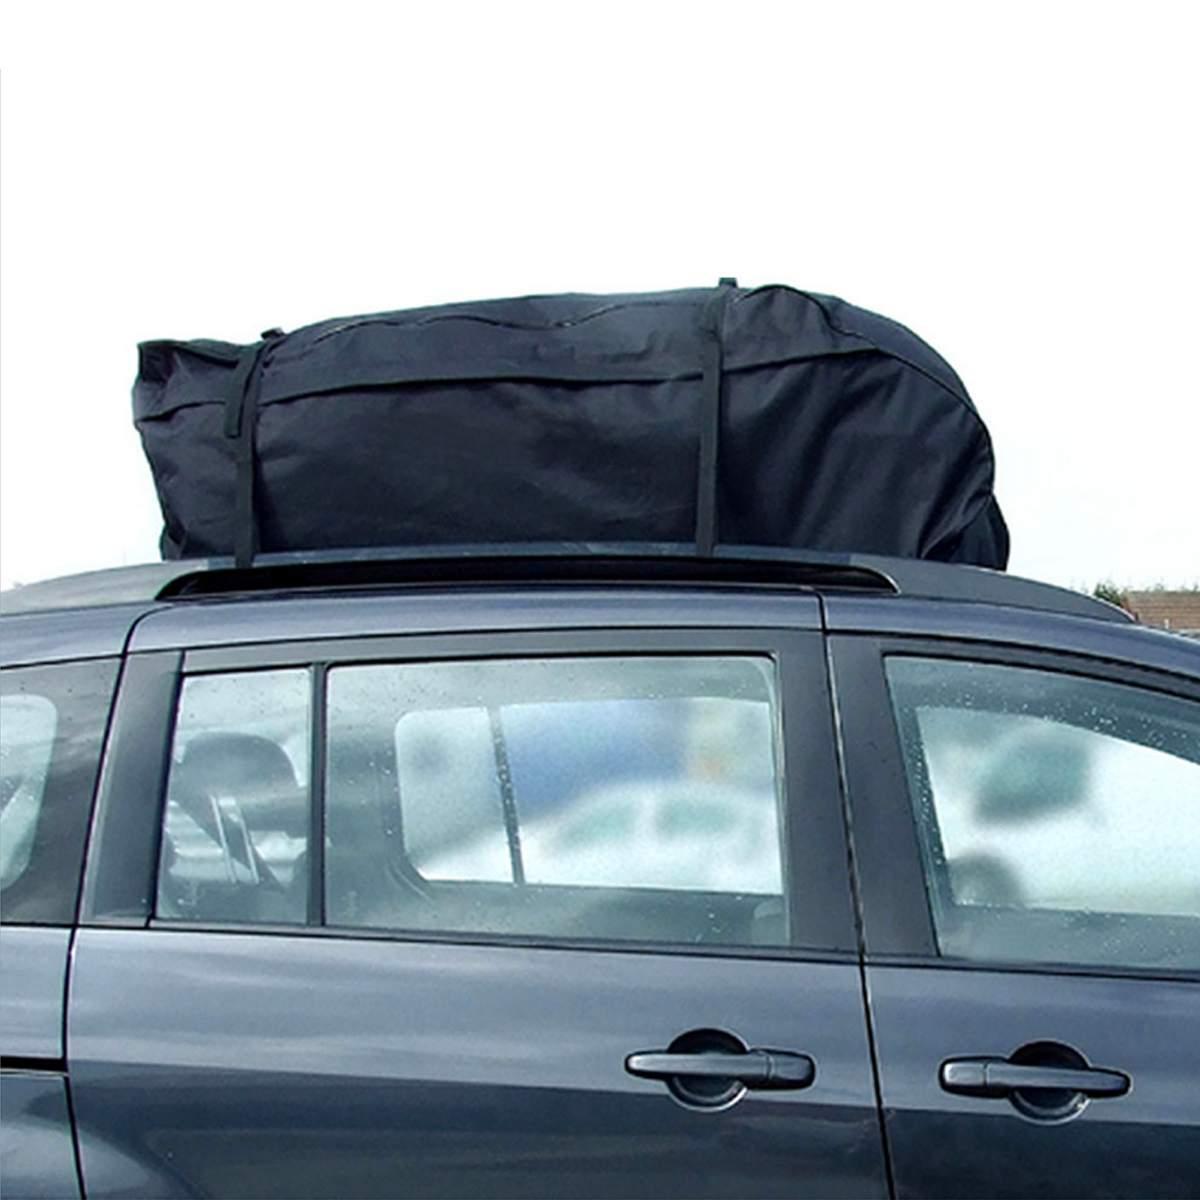 Bag Top Bag <font><b>Rack</b></font> <font><b>Cargo</b></font> Carrier Storage Waterproof Van for Cars